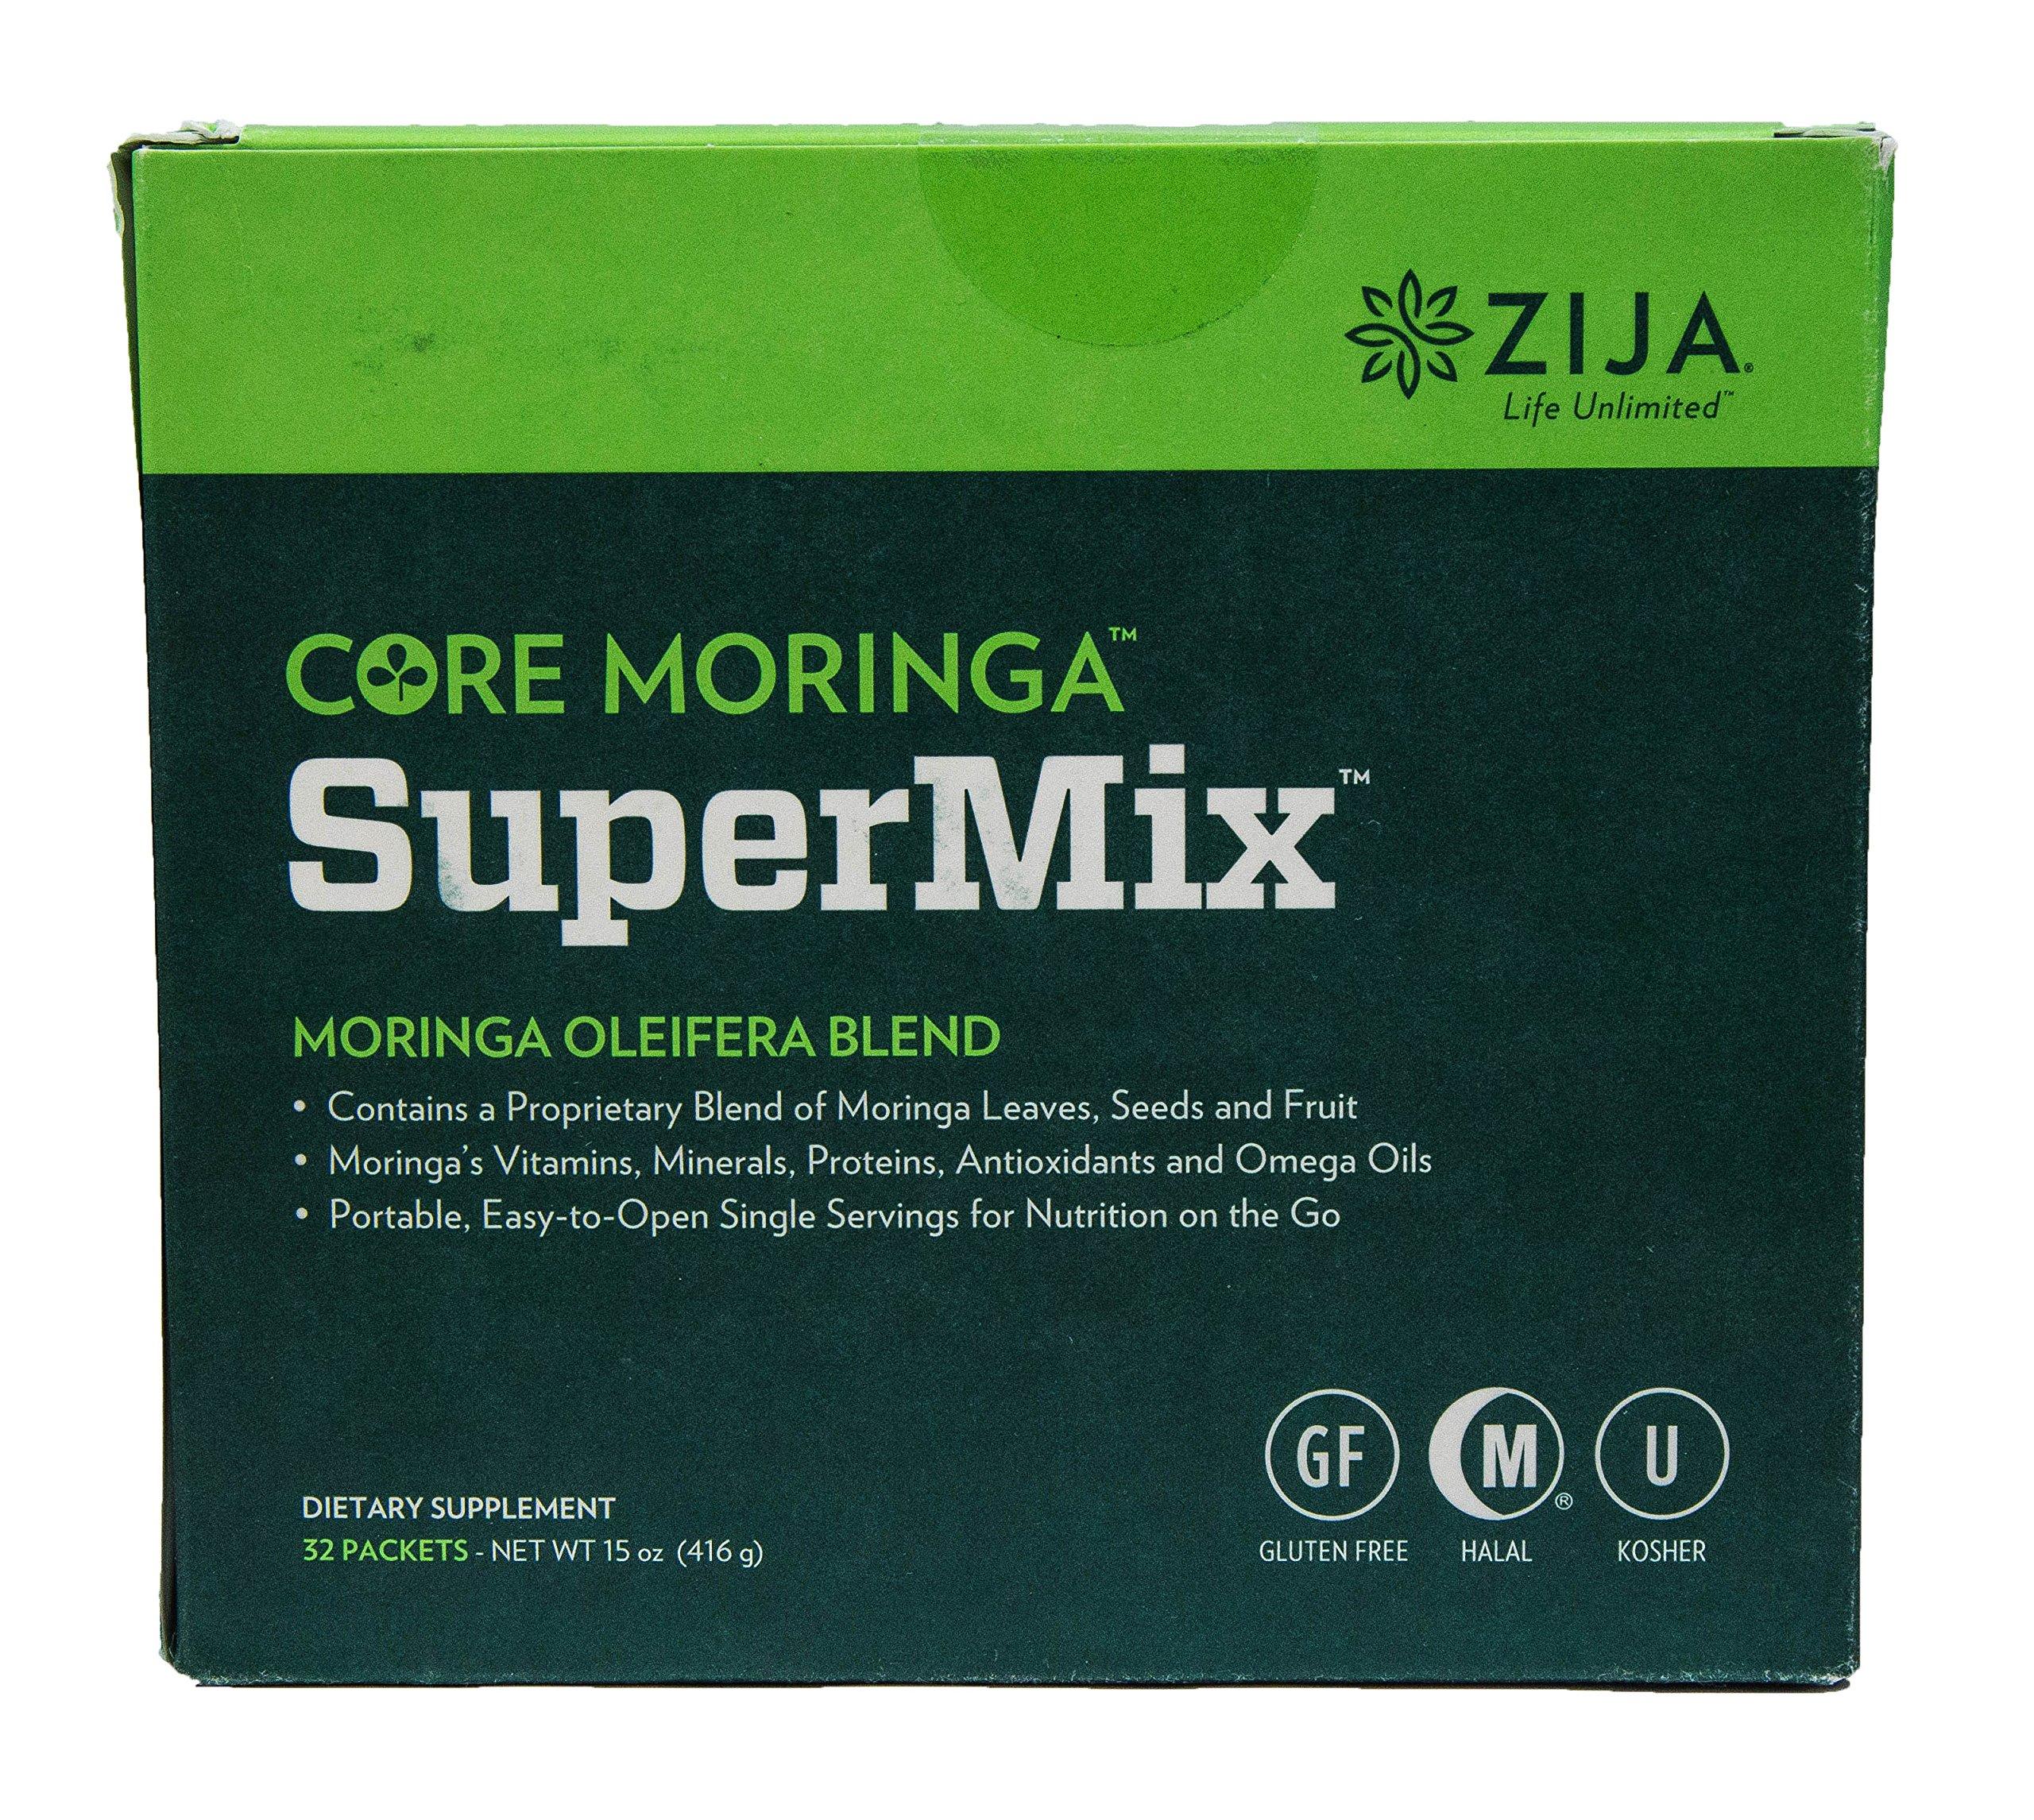 Zija International Core Moringa SuperMix Moringa Oleifera Blend 32 Pack